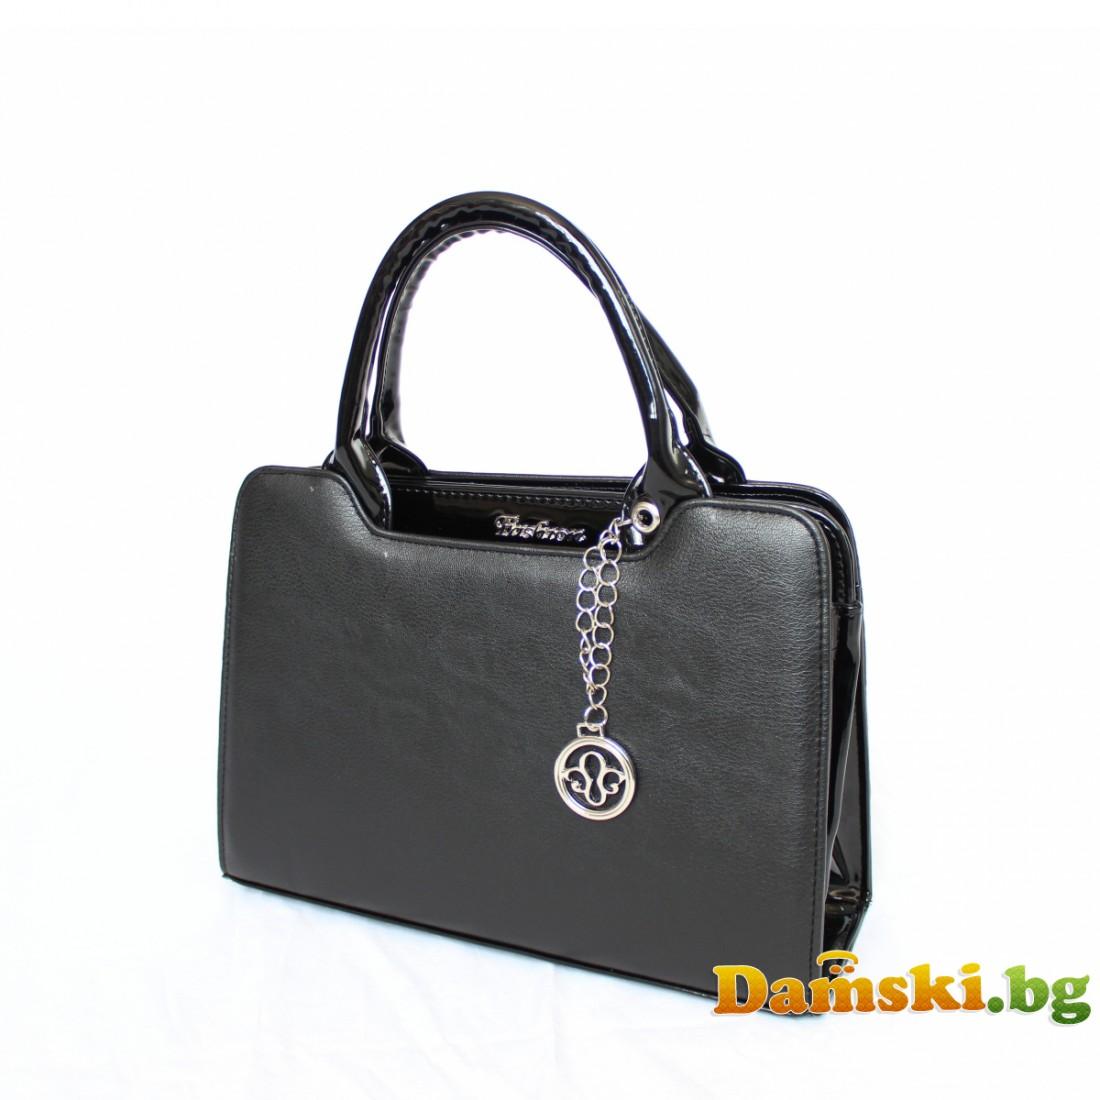 Стилна дамска чанта Хриси - черна